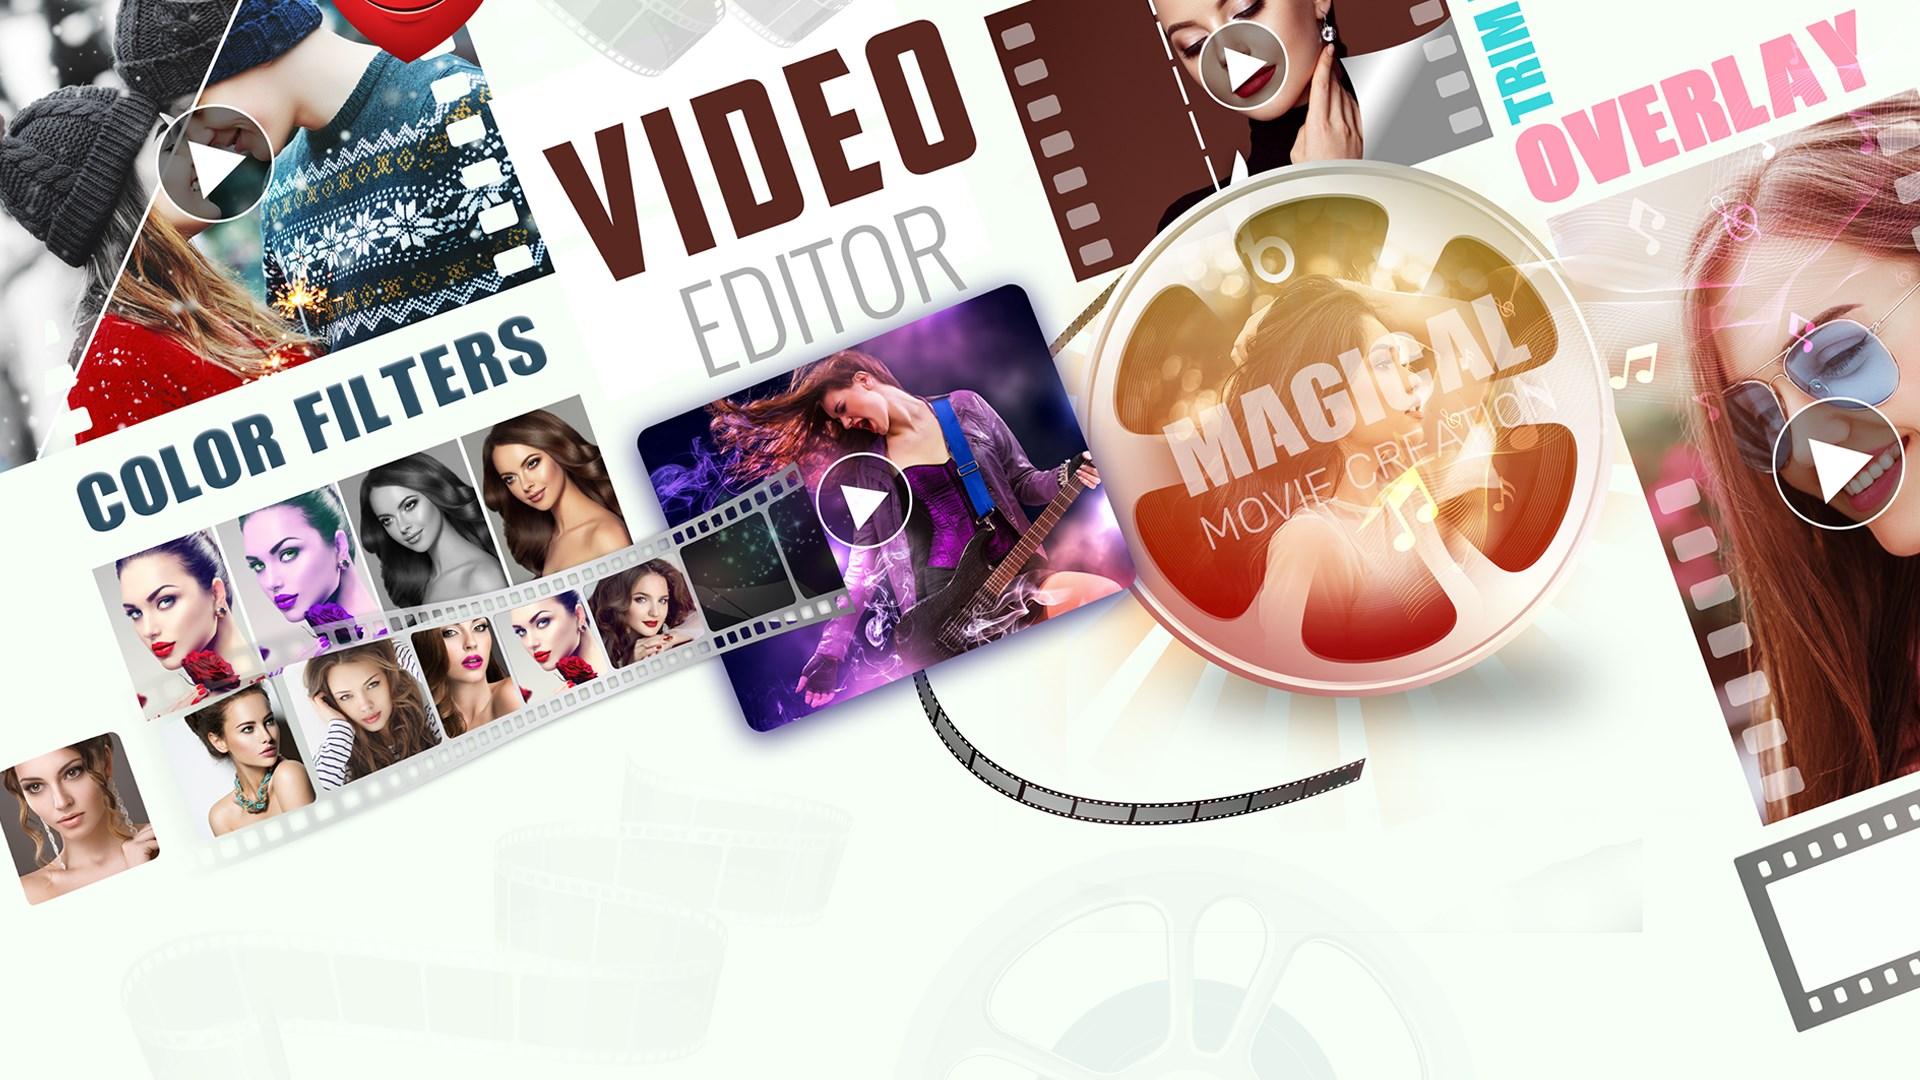 Get Movie Maker Video Editor For Windows Microsoft Store